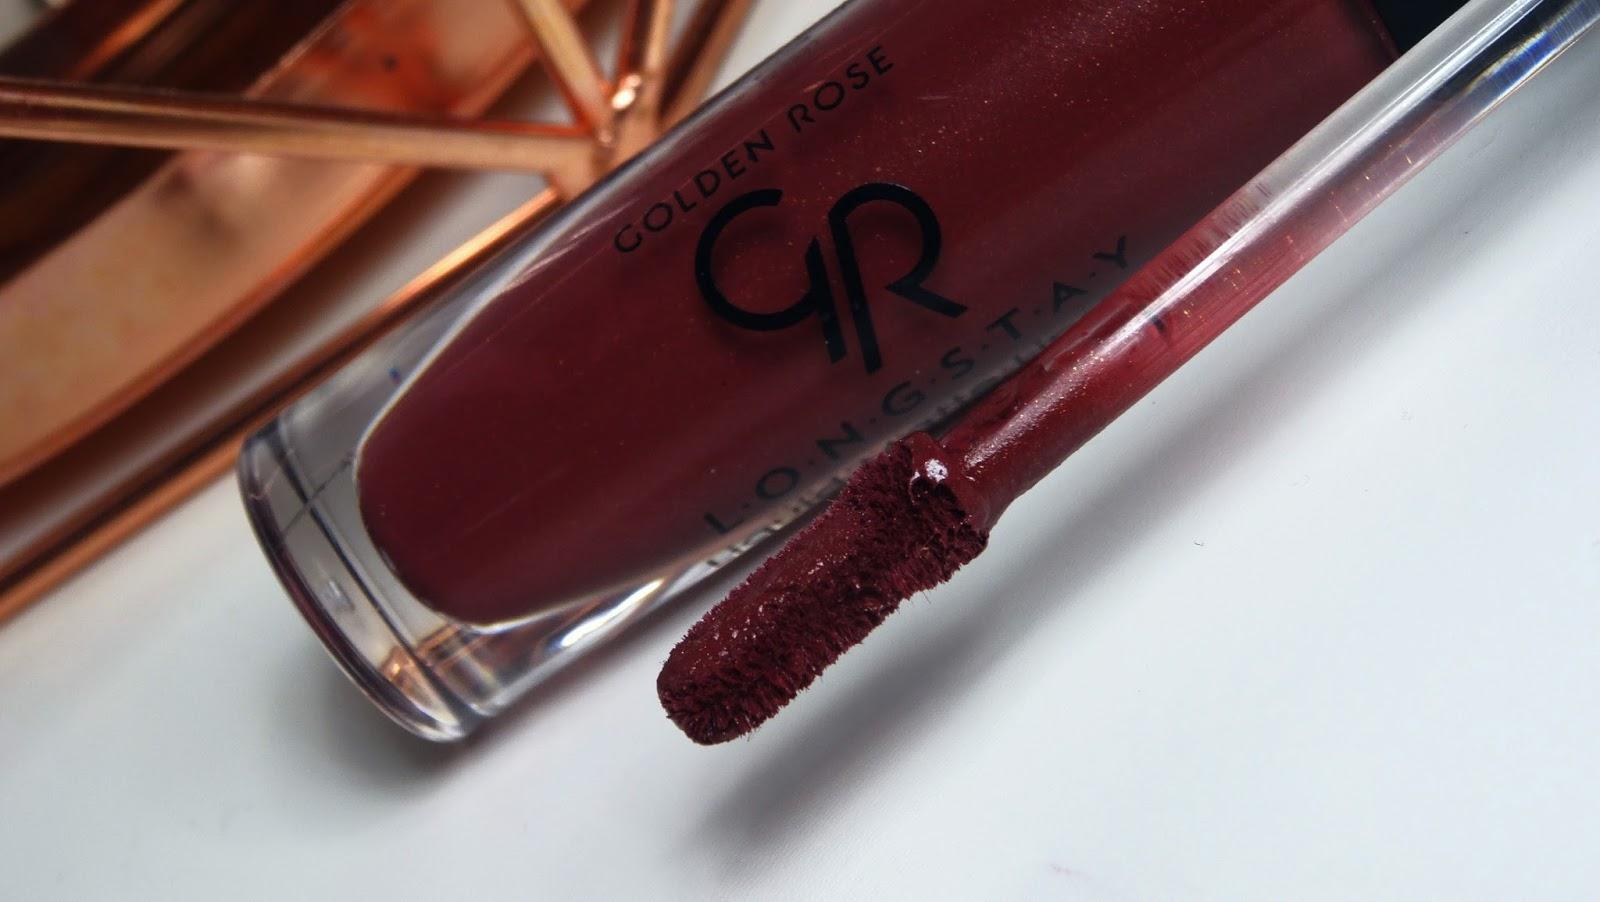 golden rose, matowa pomadka, longstay liquid matte lipstick 12, trwałe pomadki